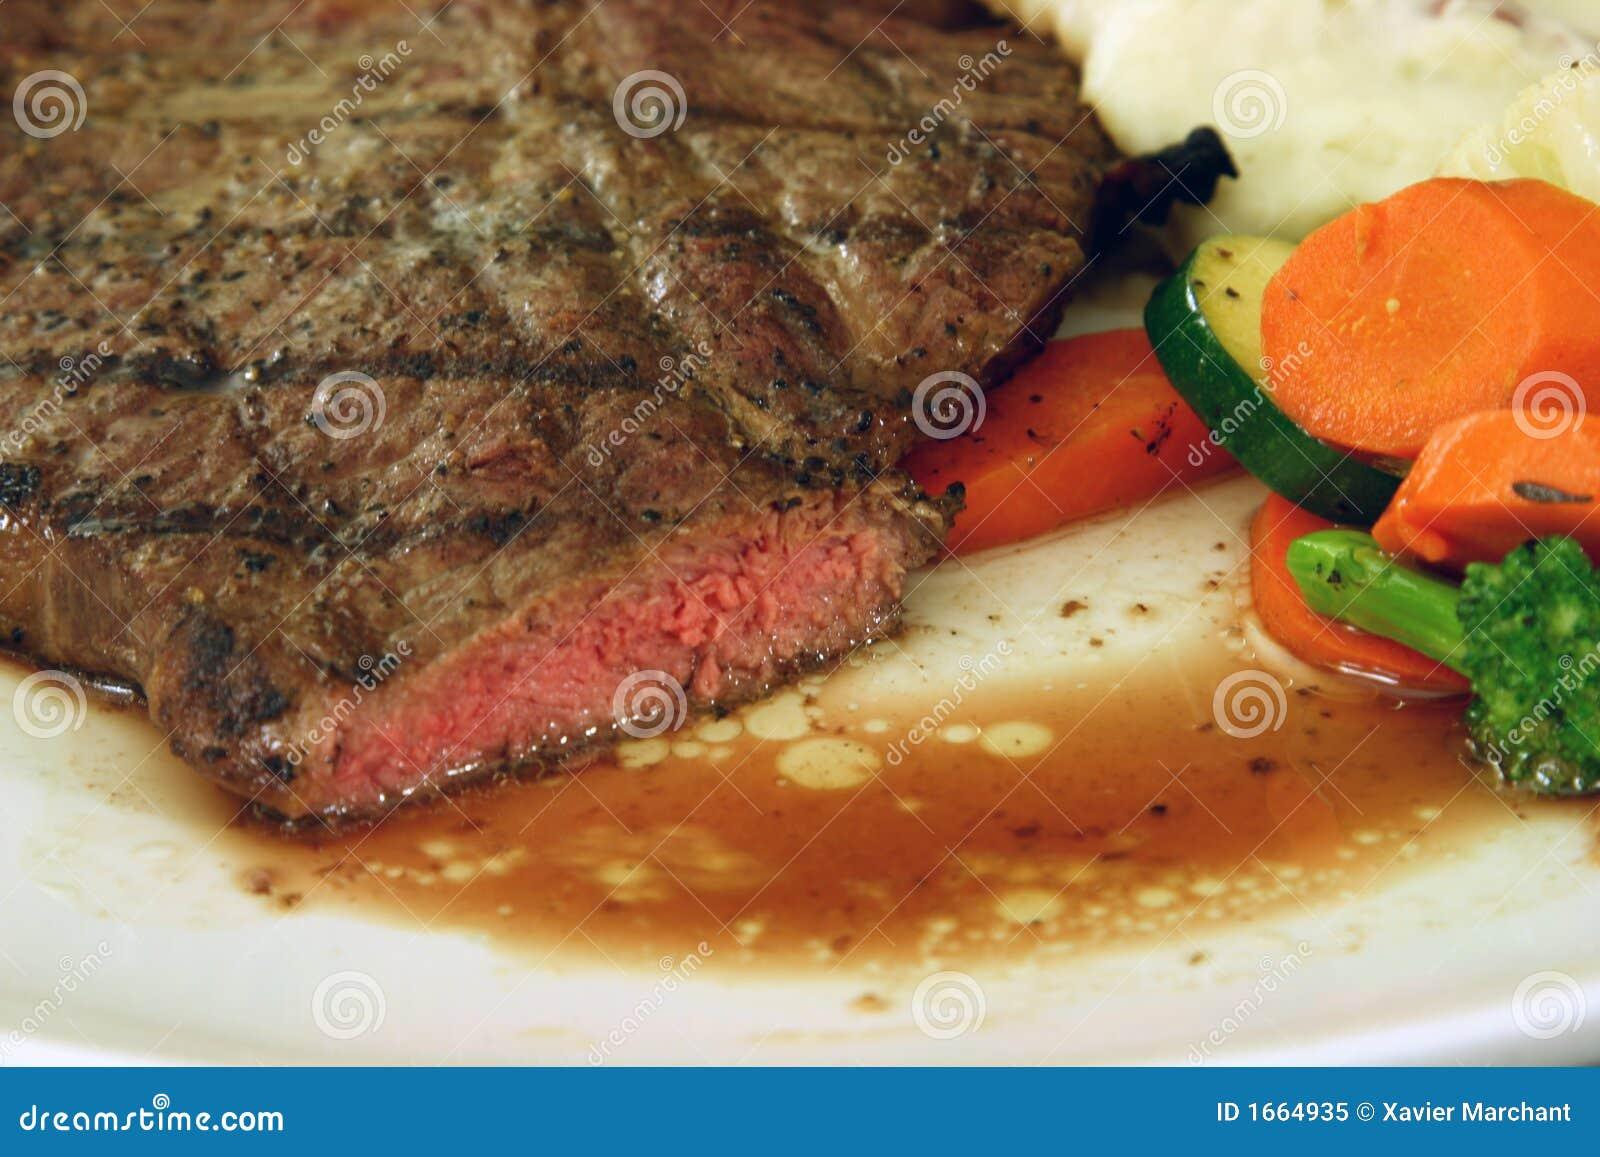 how to cook sirloin steak medium rare on grill